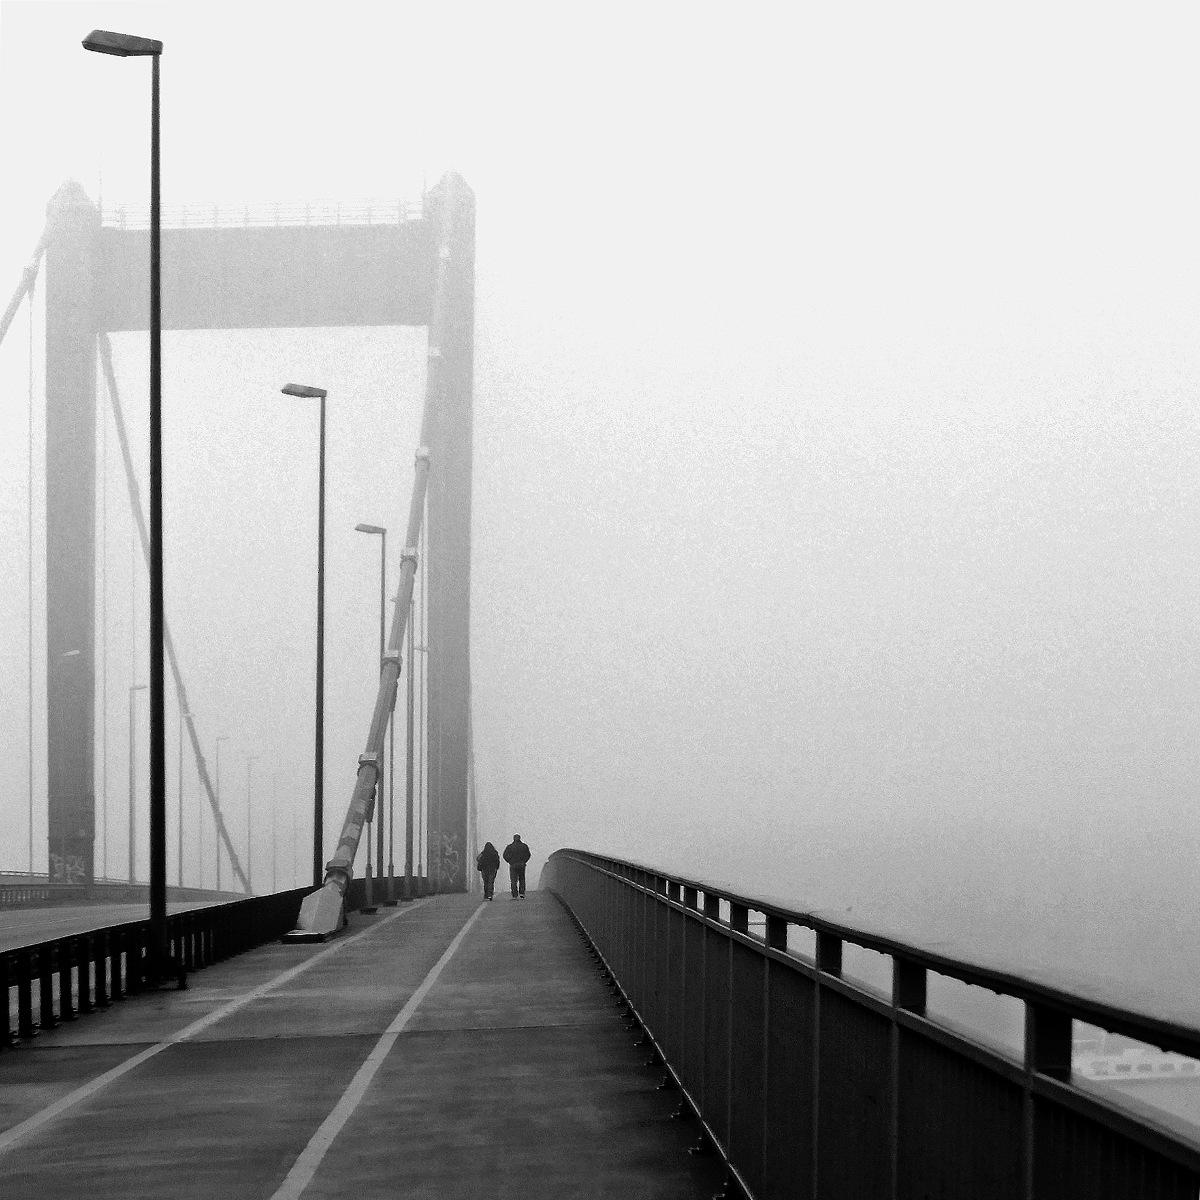 Bridge by Gernot Schwarz